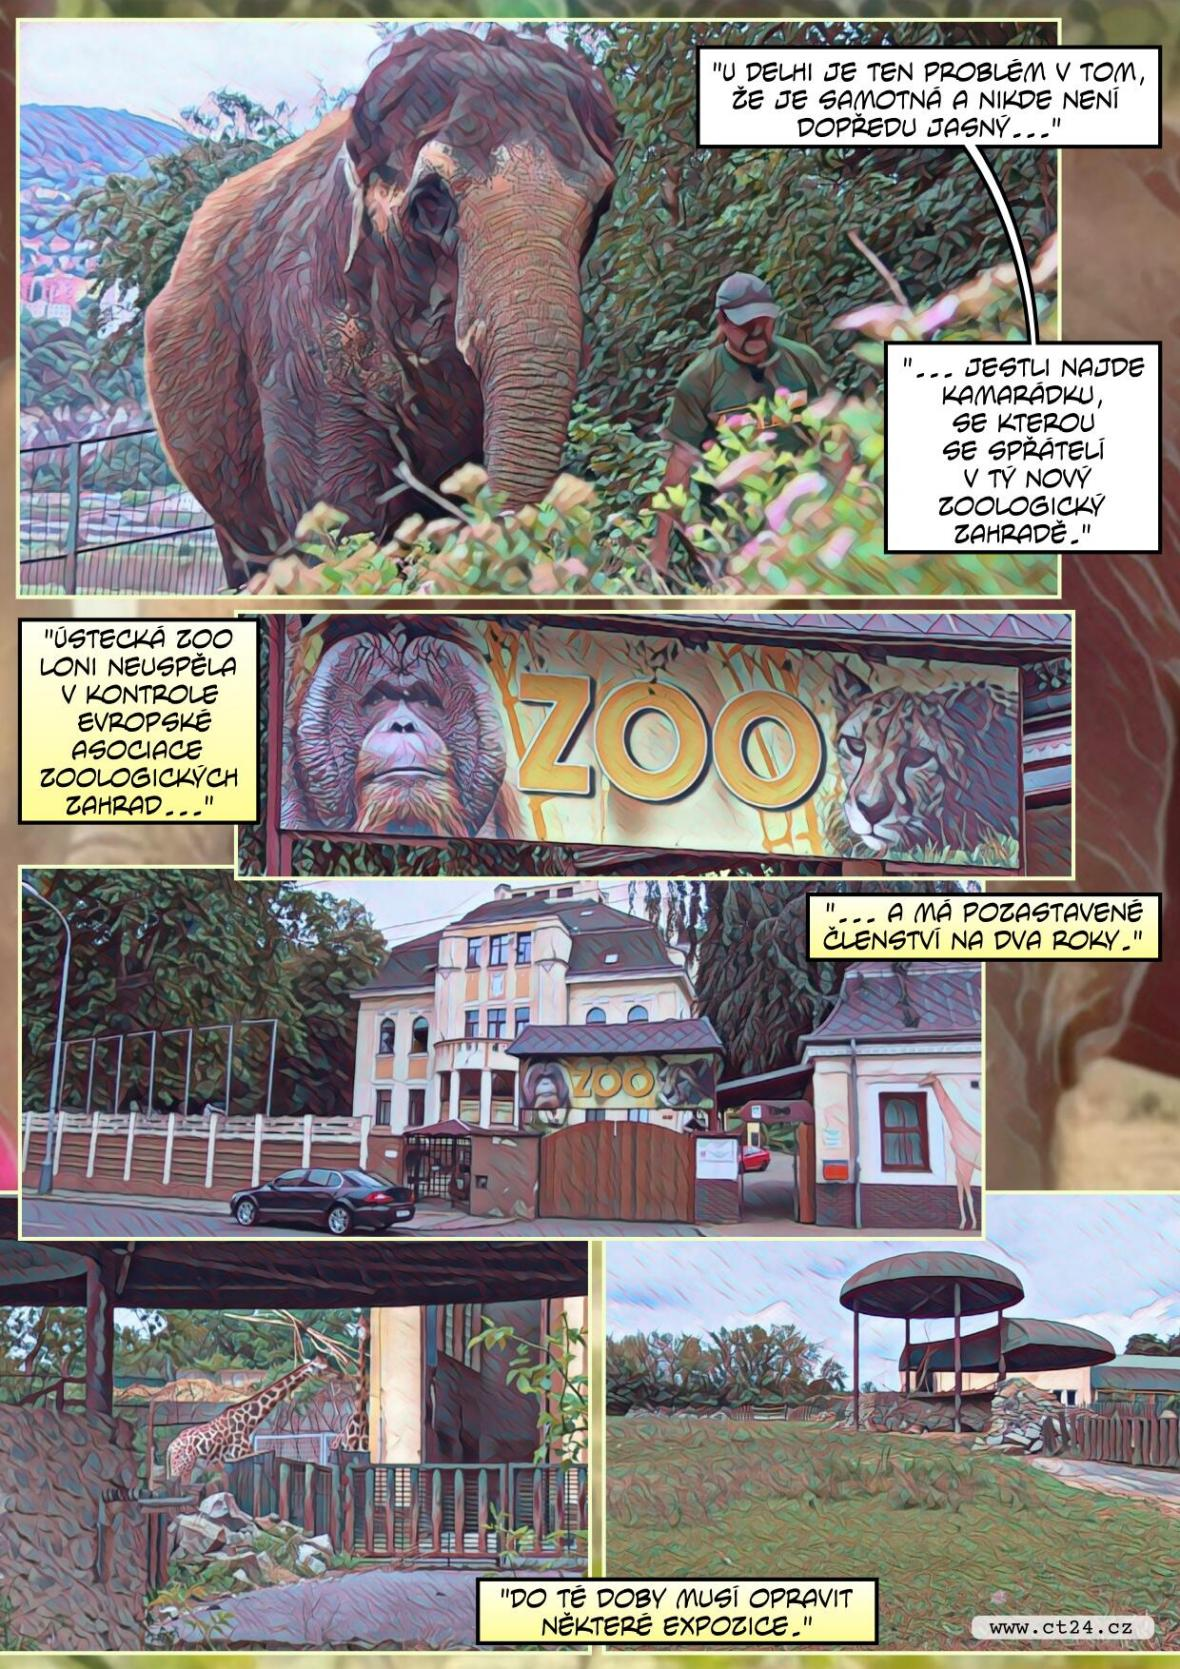 Slonice Dehli bude mít nový domov